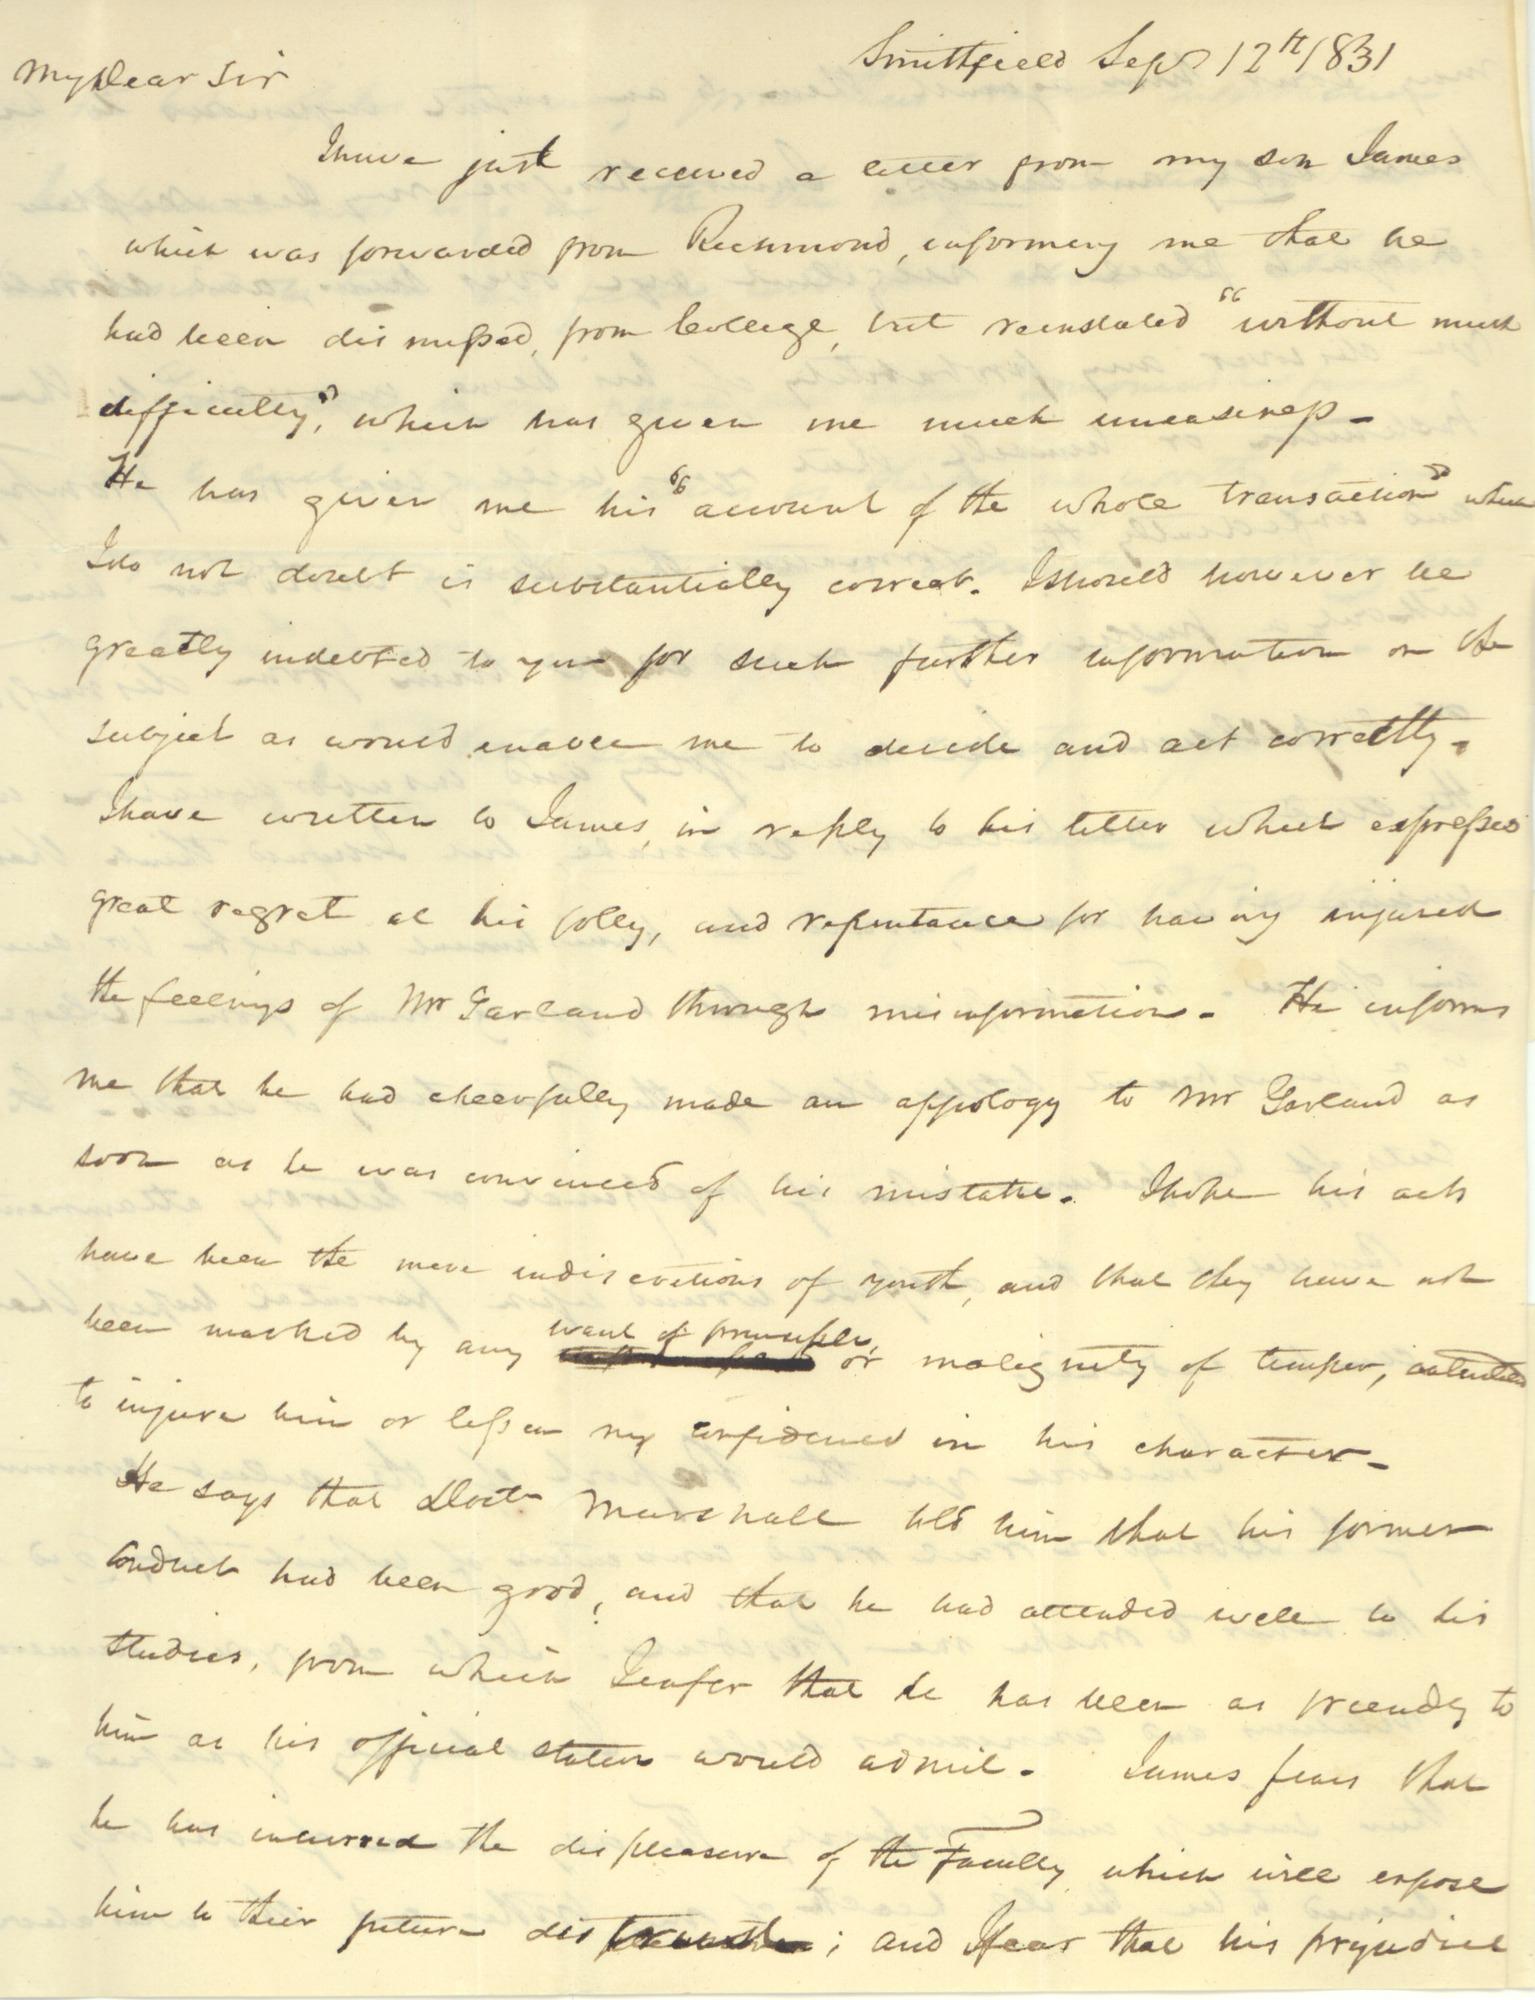 Ms1997_002_SmithfieldPreston_Letter_1831_0912a.jpg